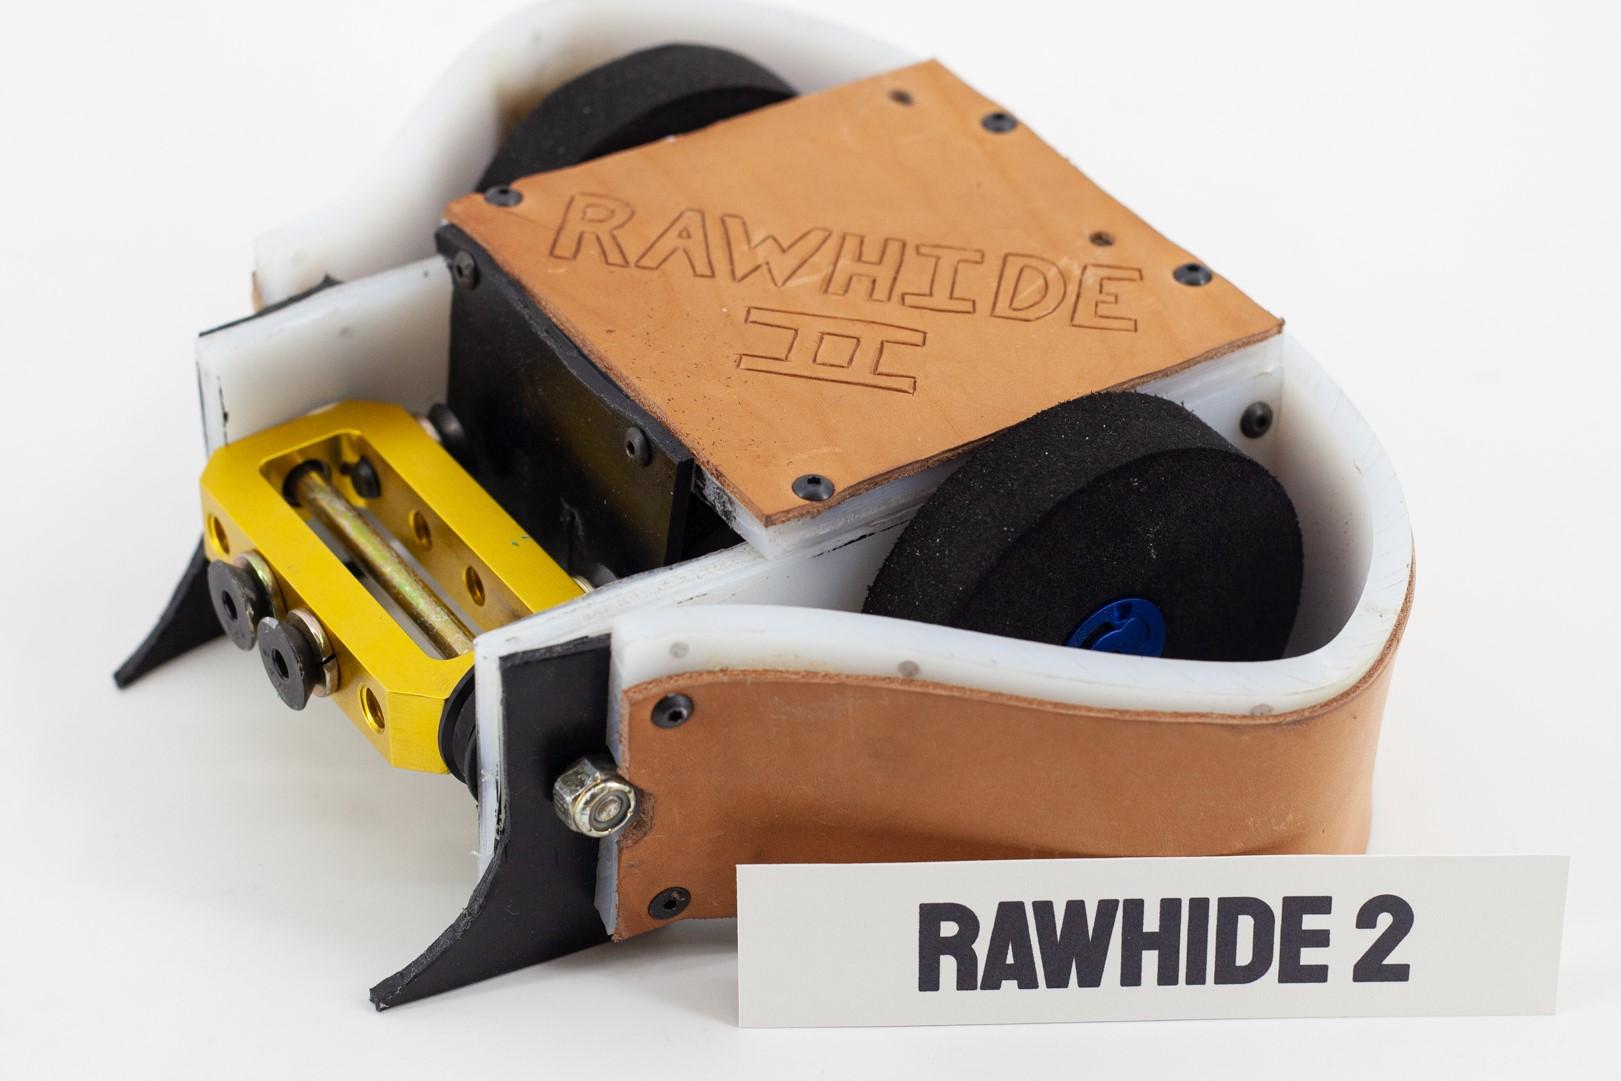 Rawhide2